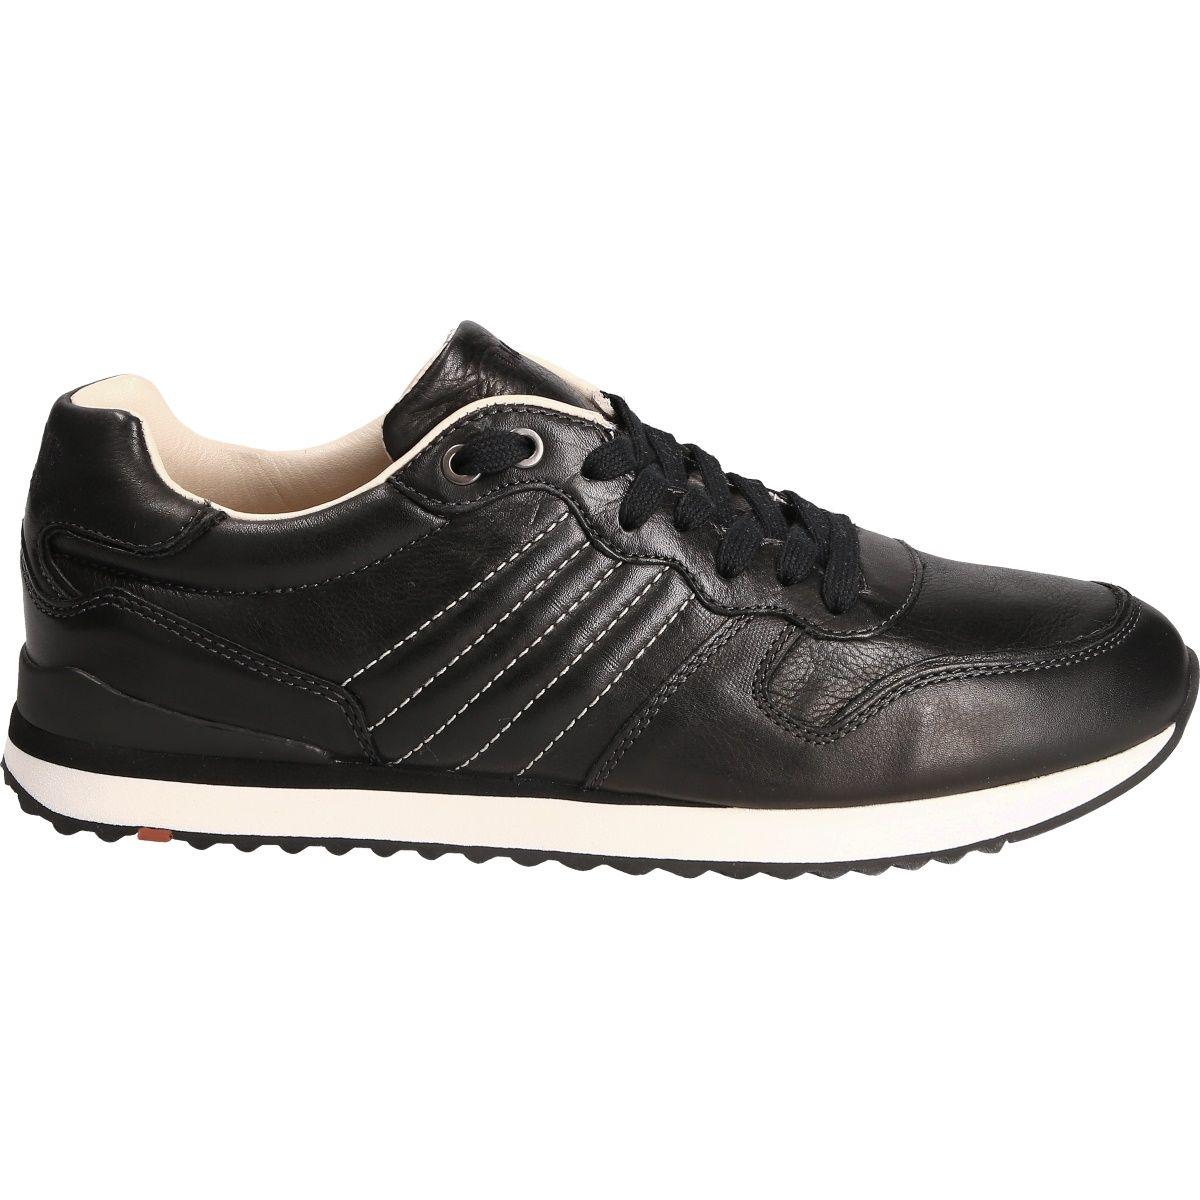 Lloyd 18 400 00 Edico Men S Shoes Lace Ups Buy Shoes At